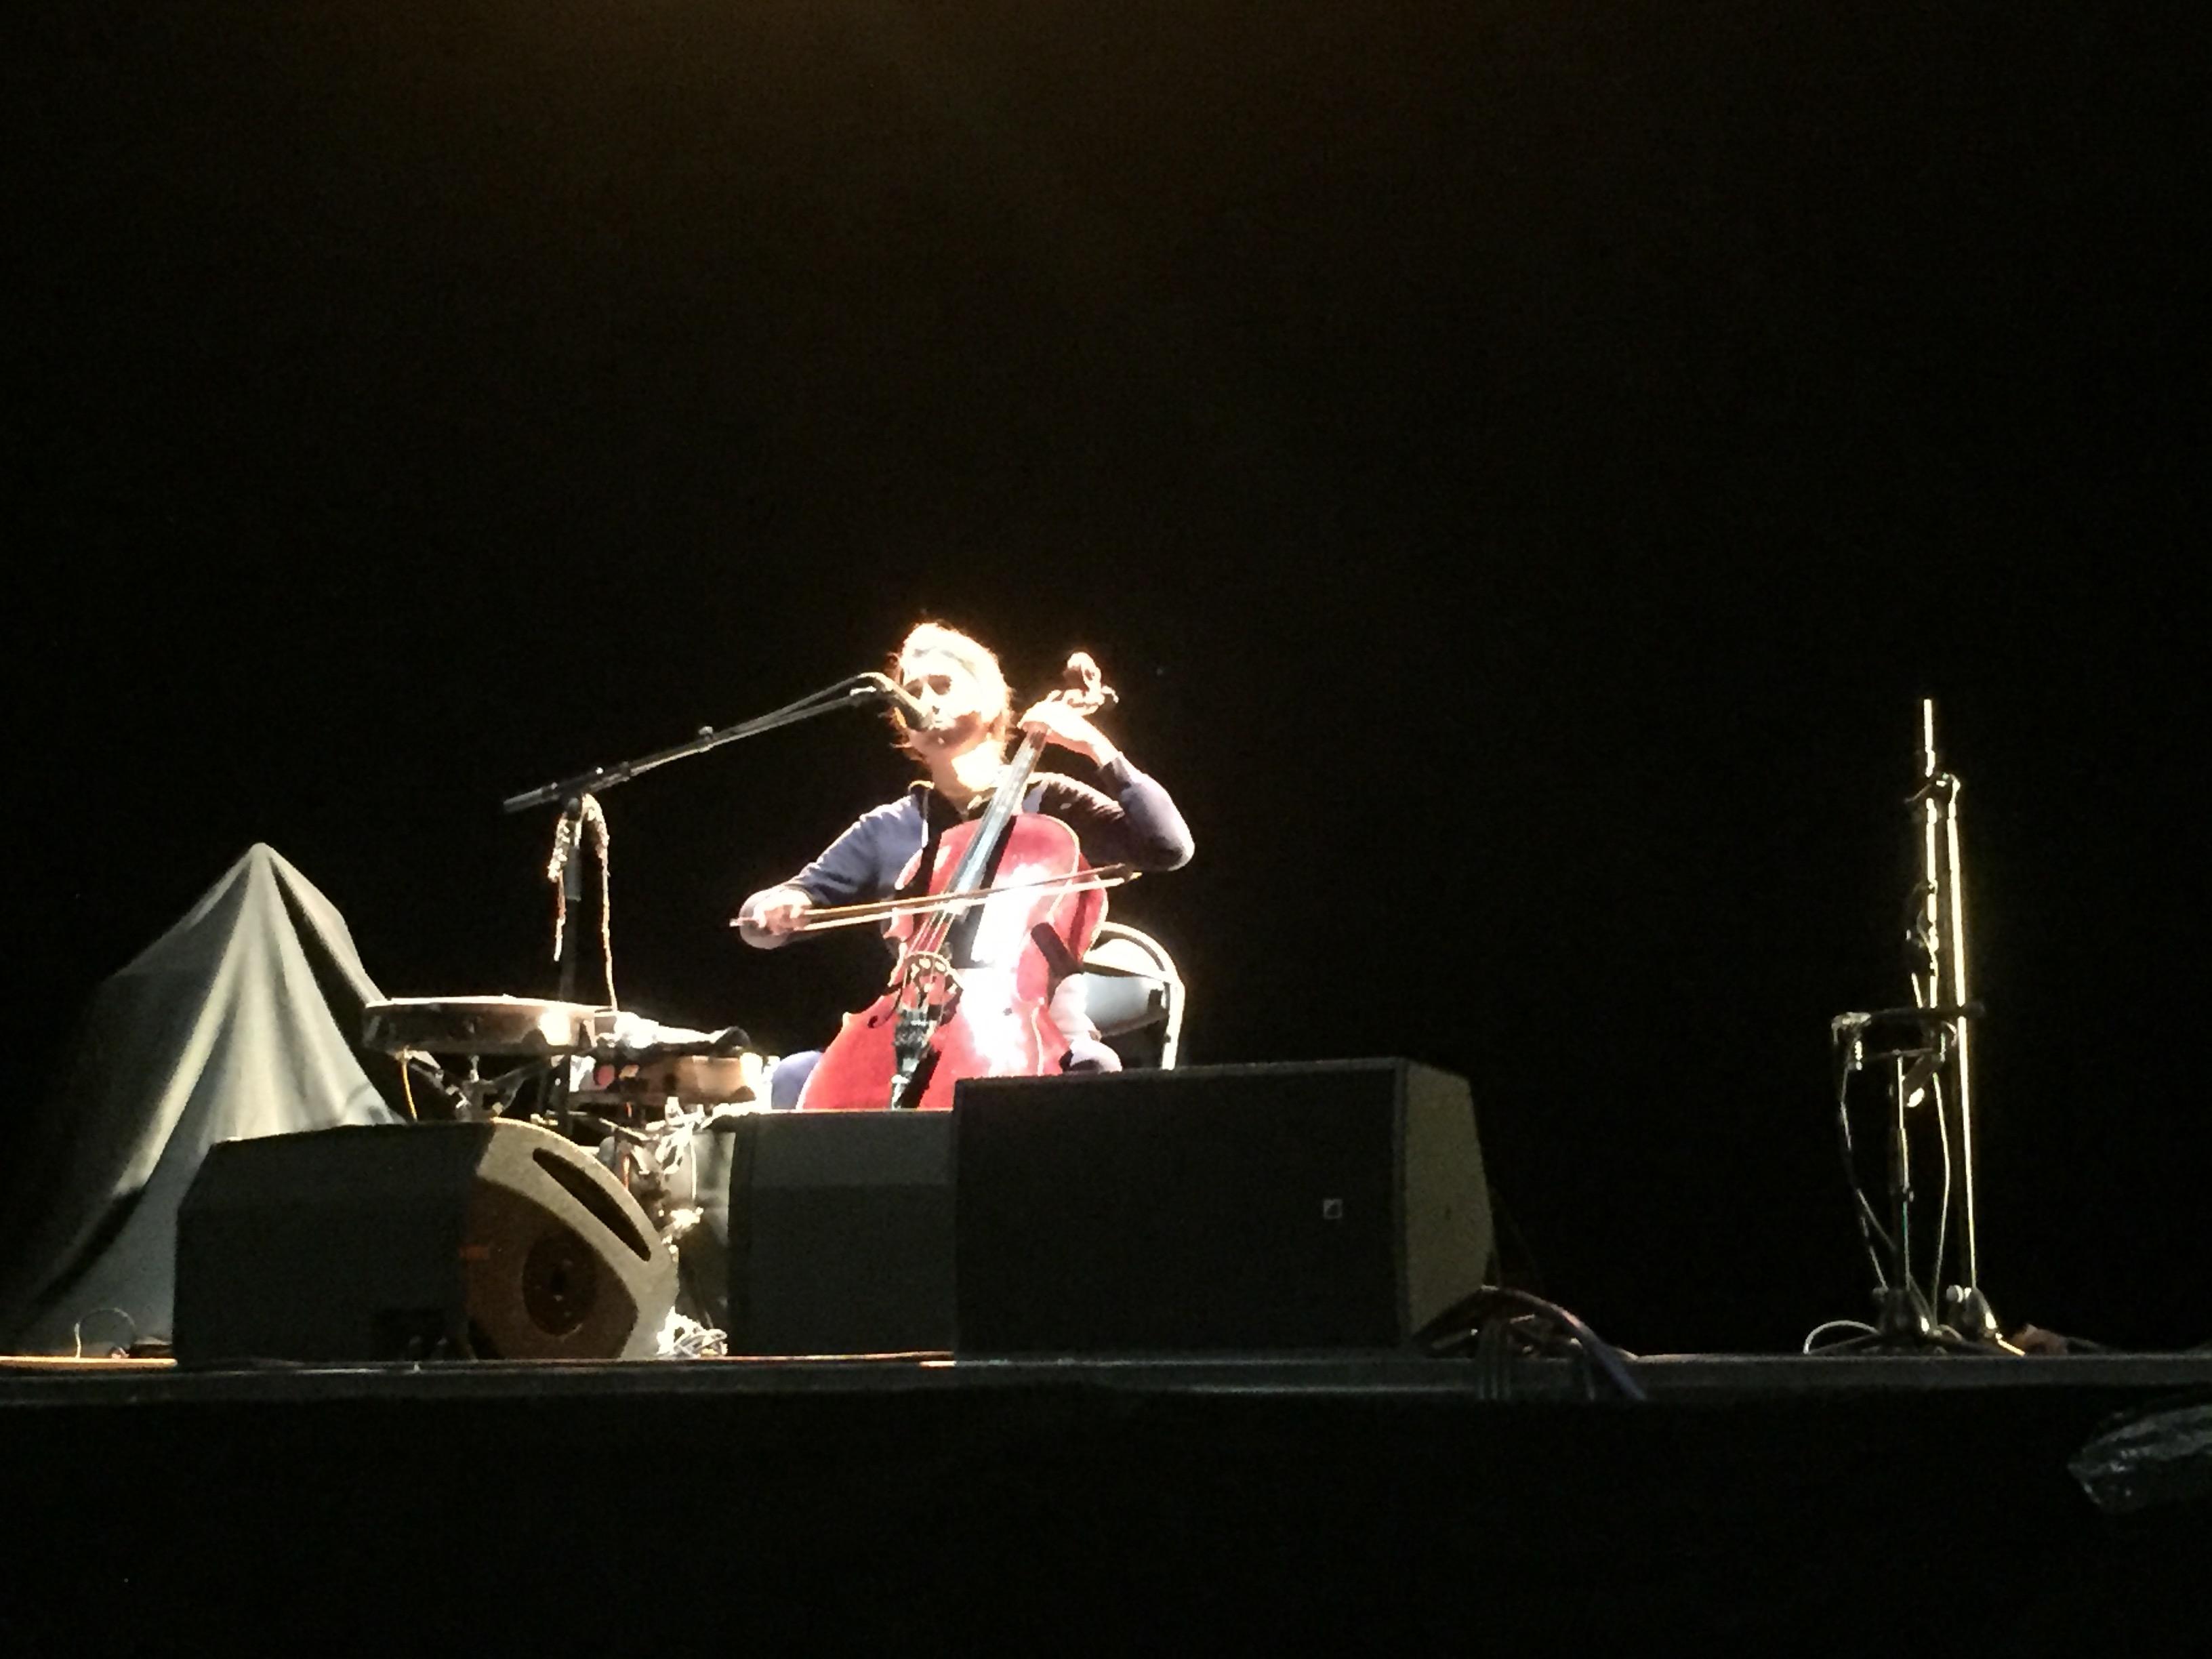 Musicales de Bastia: la jolie voix de Dom la Nena a enchanté le public de l'Alb'Oru